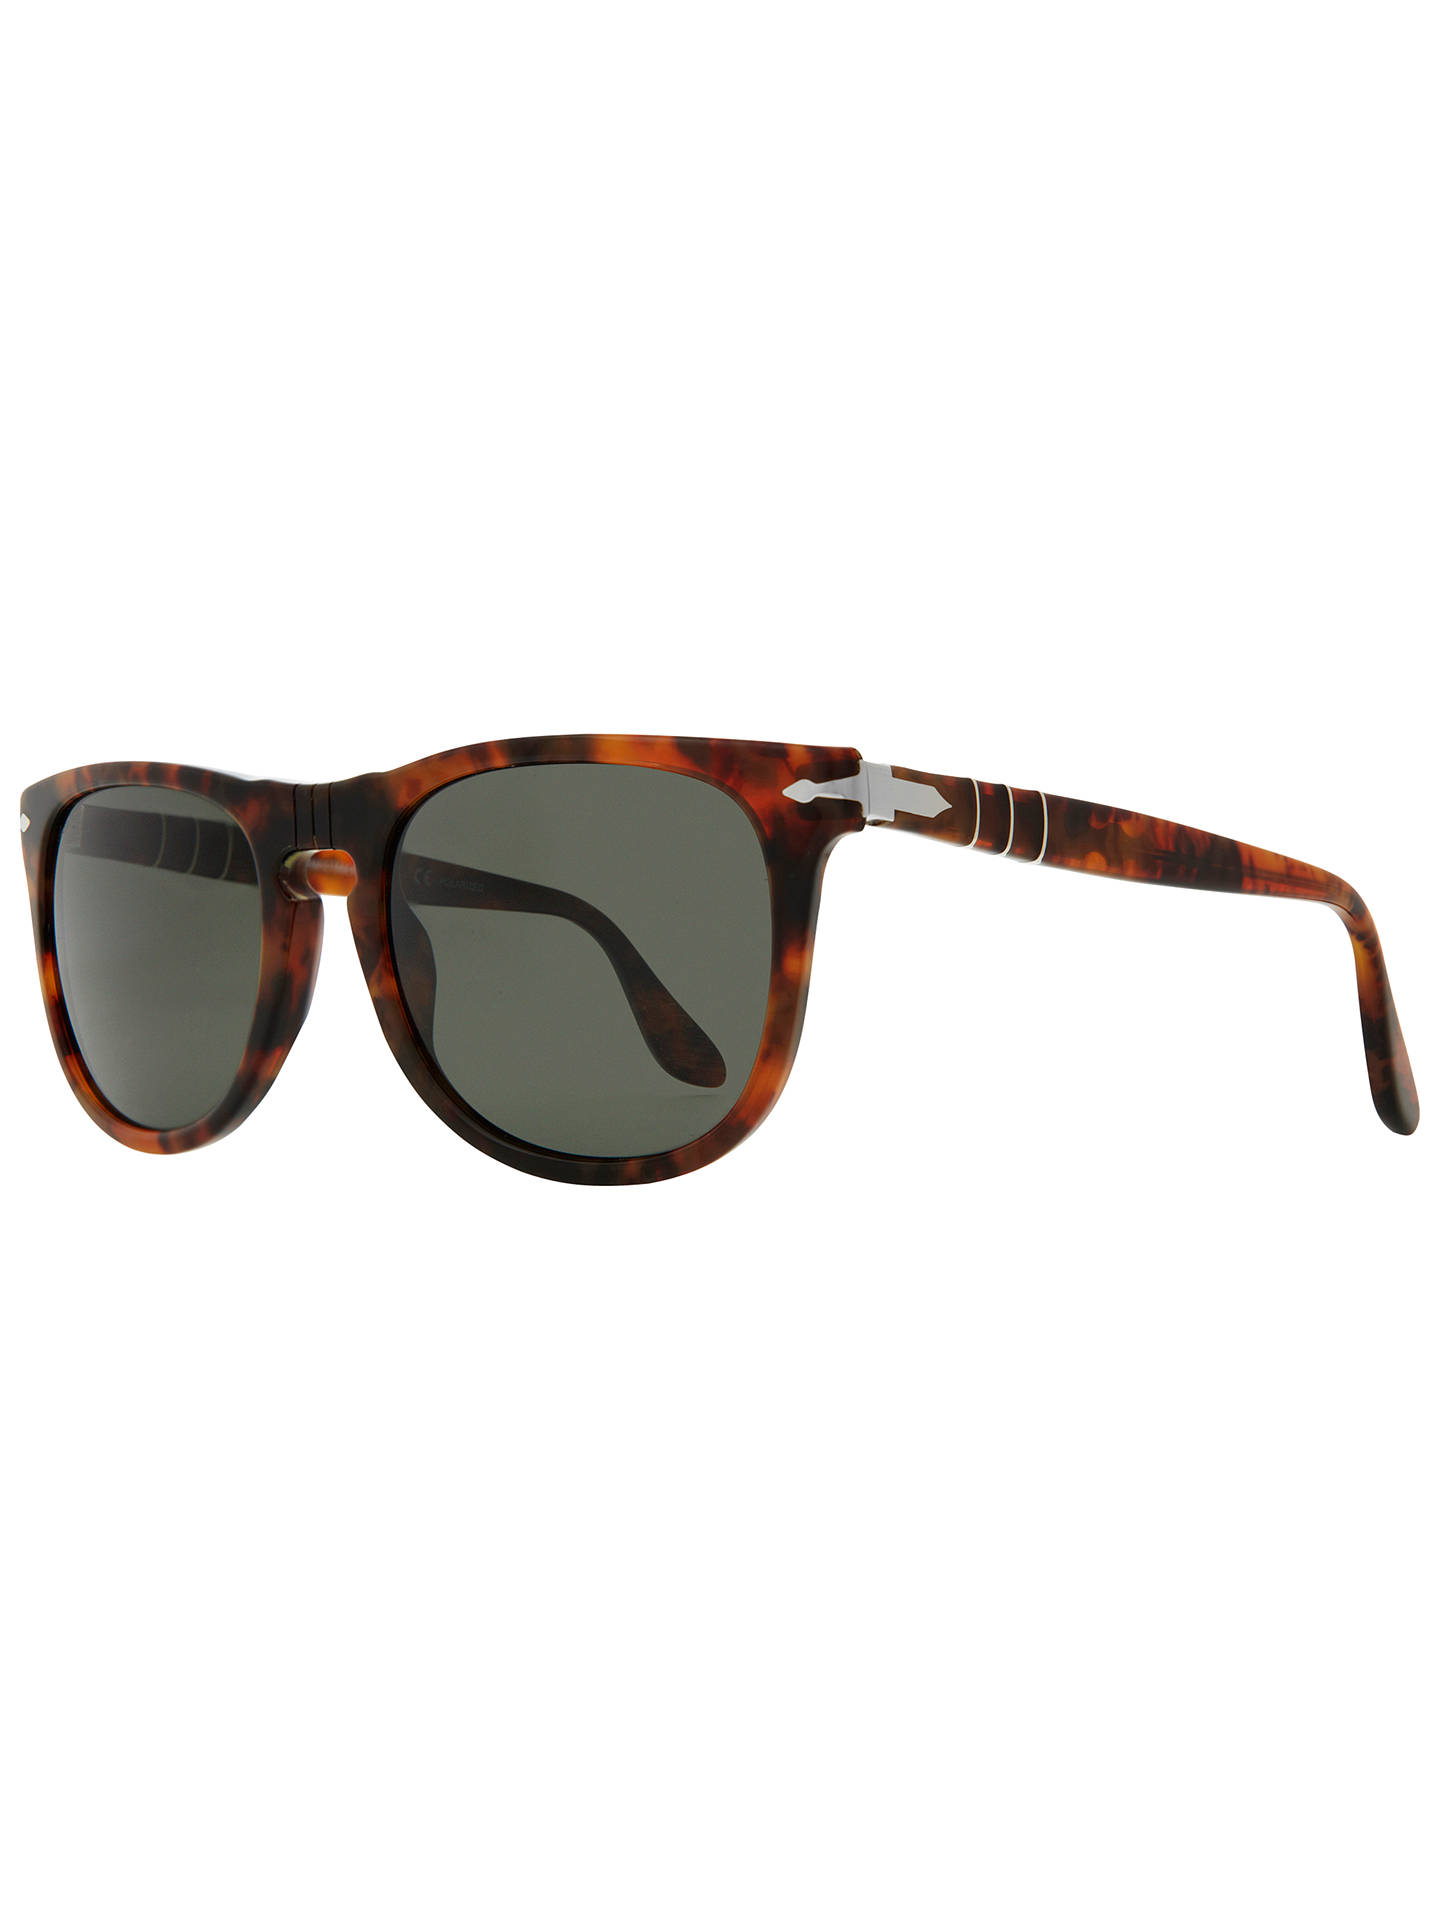 78e336536e3e Buy Persol PO3055S 108/58 Rectangular Polarised Sunglasses, Tortoise Online  at johnlewis.com ...